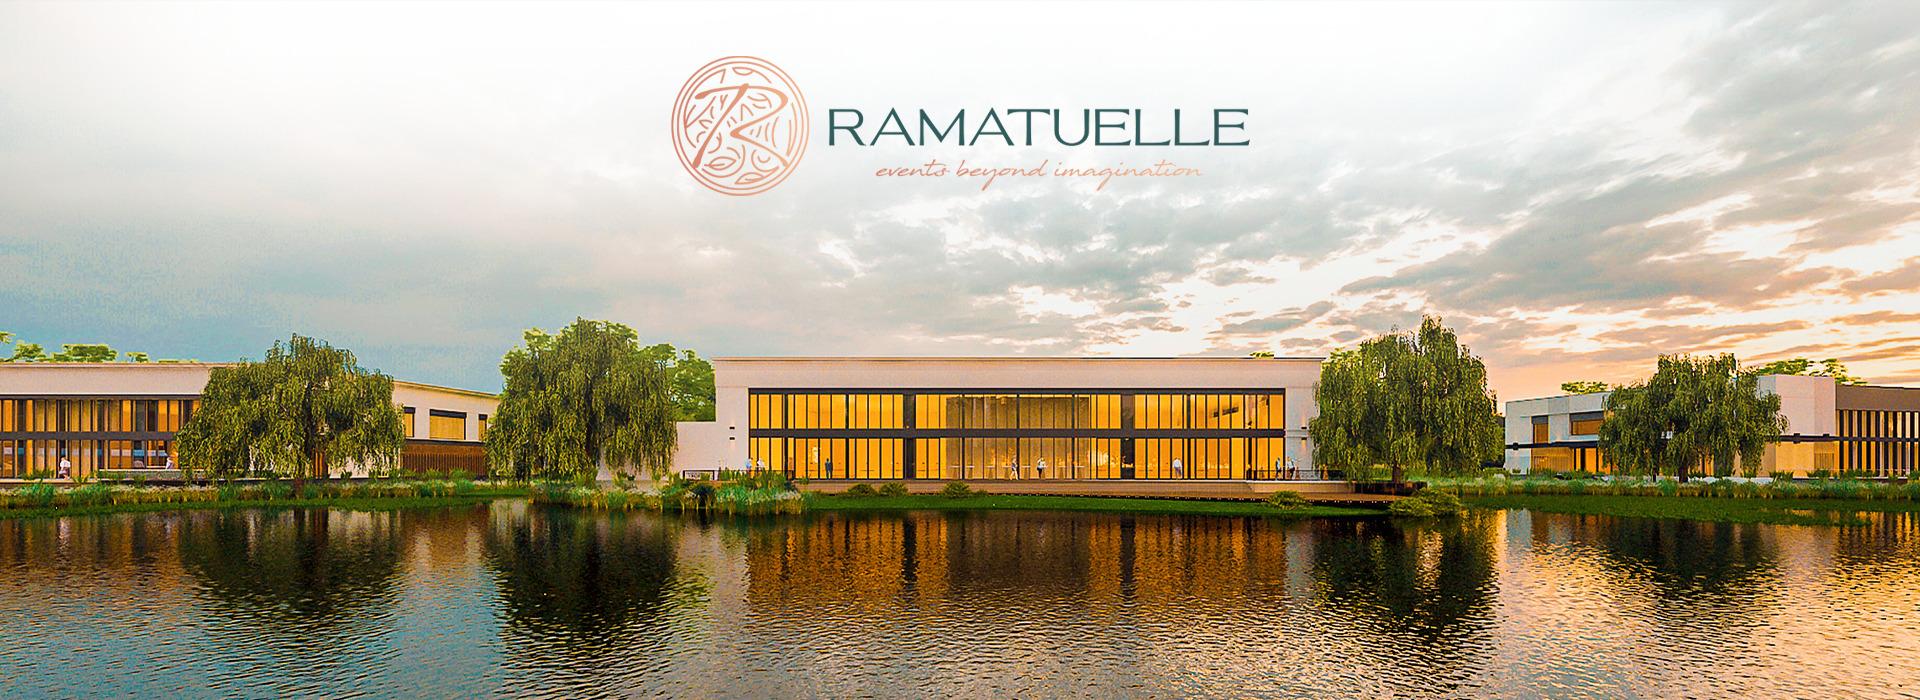 Banner_Ramatuelle2